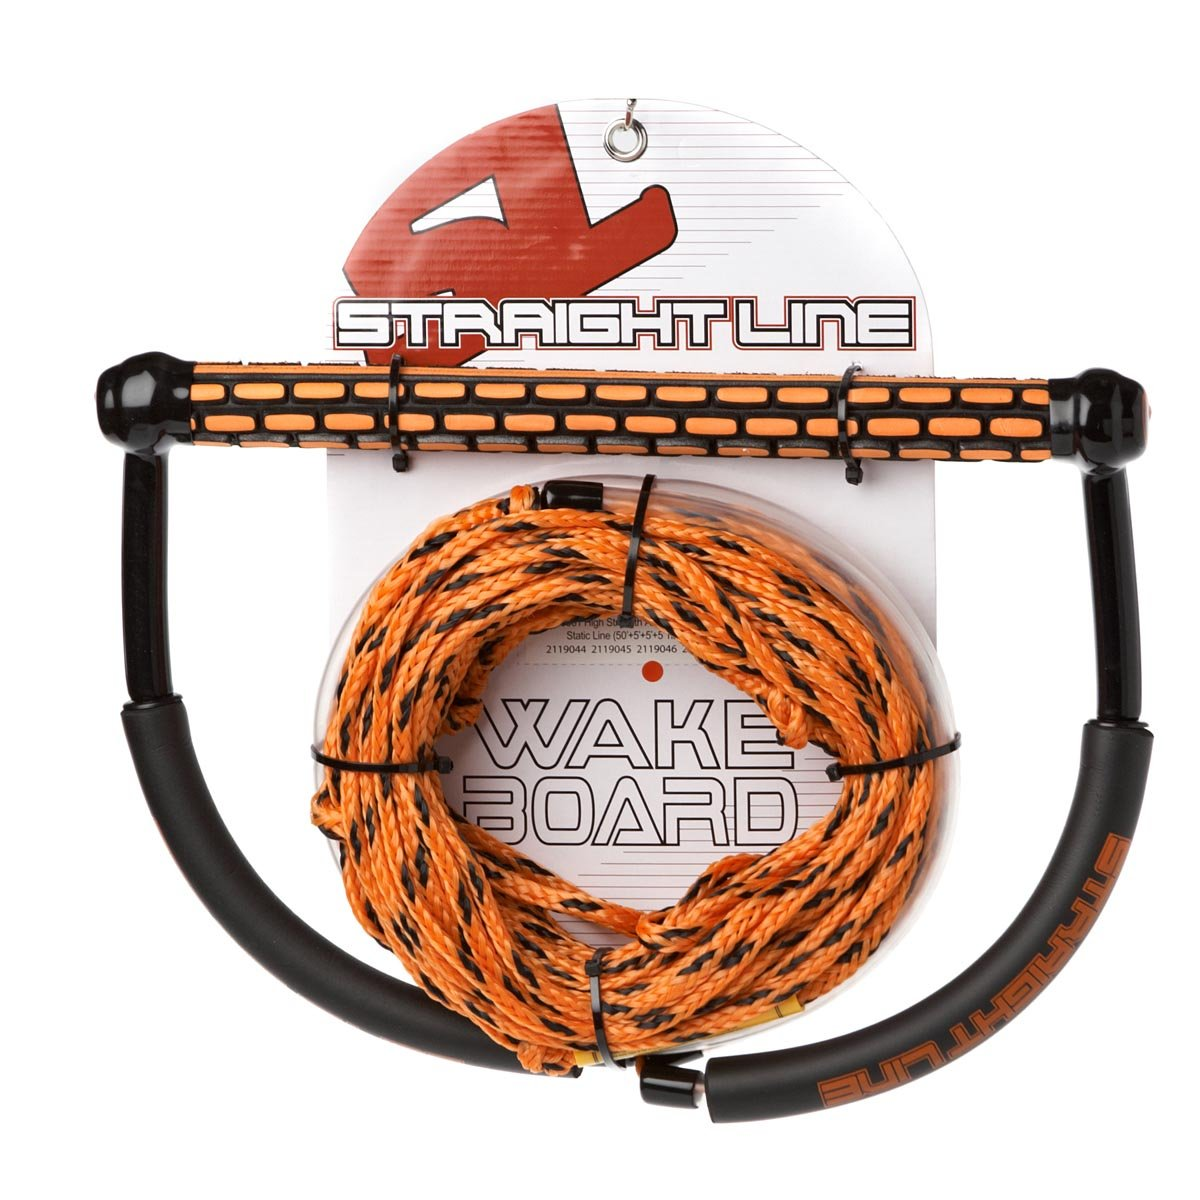 Straightline Eva TR9 - Wakeboard, color naranja